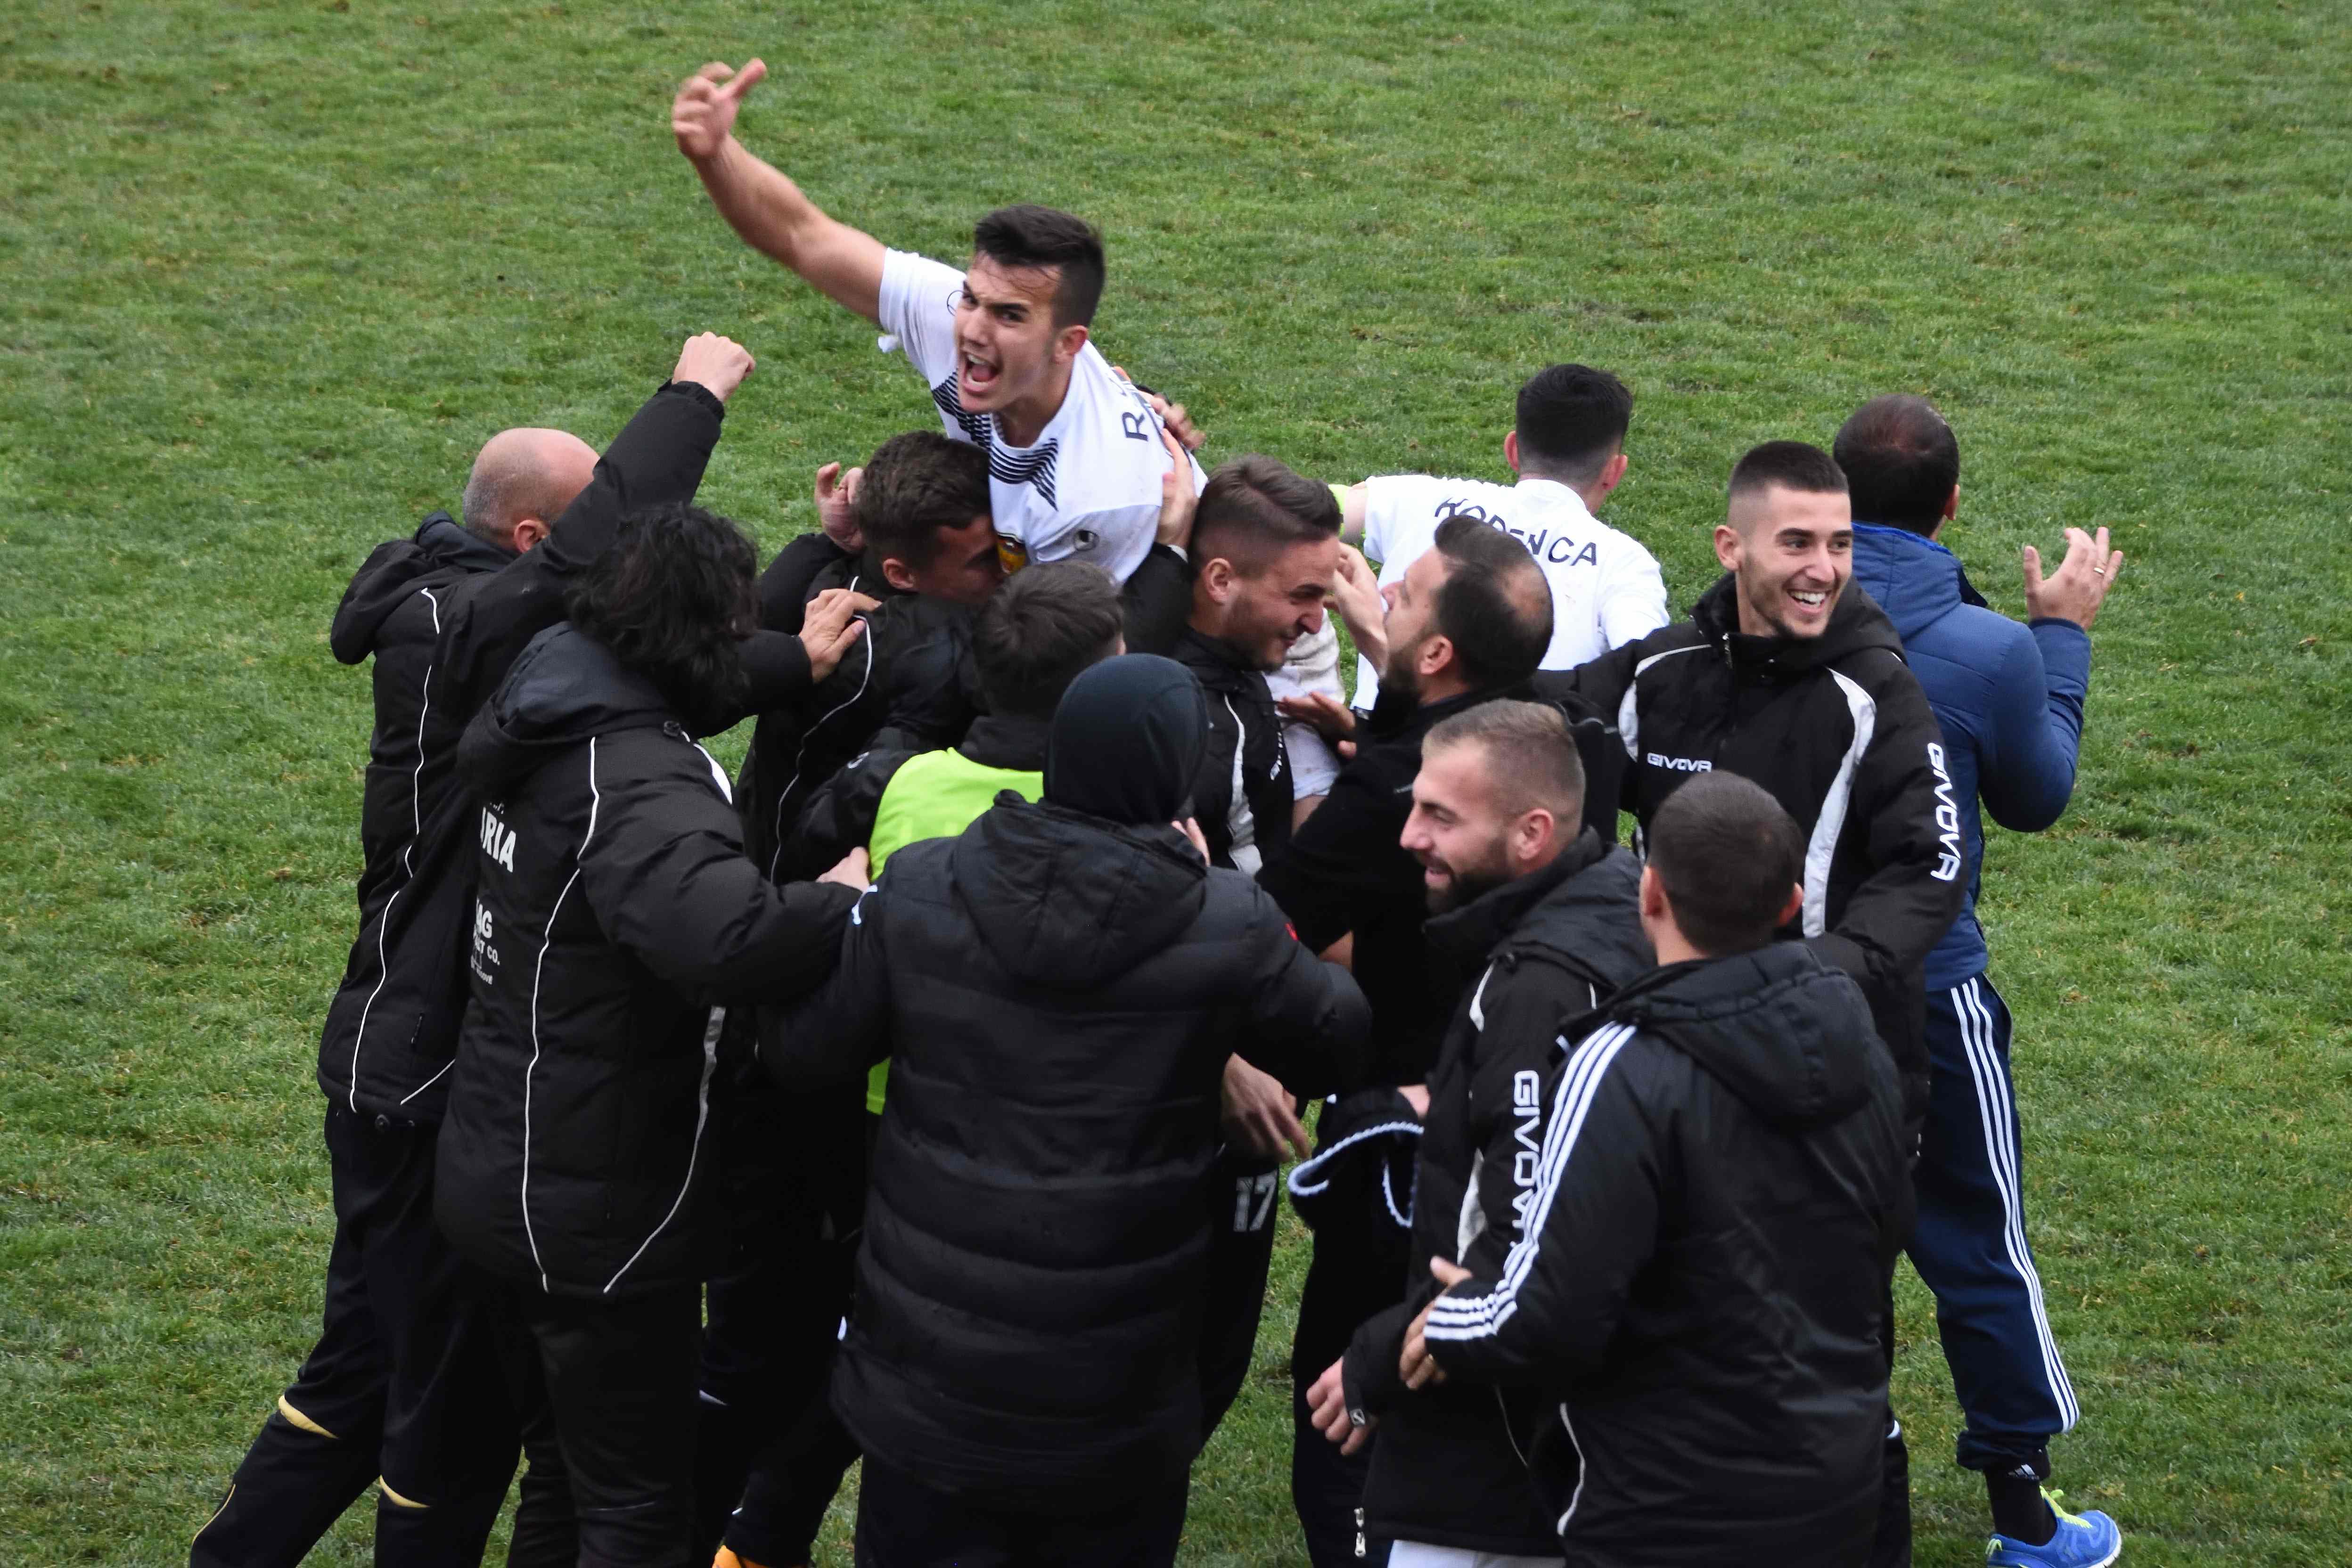 Football Nation 26/55 - Kosovo - Drita 4-3 Liria Prizren